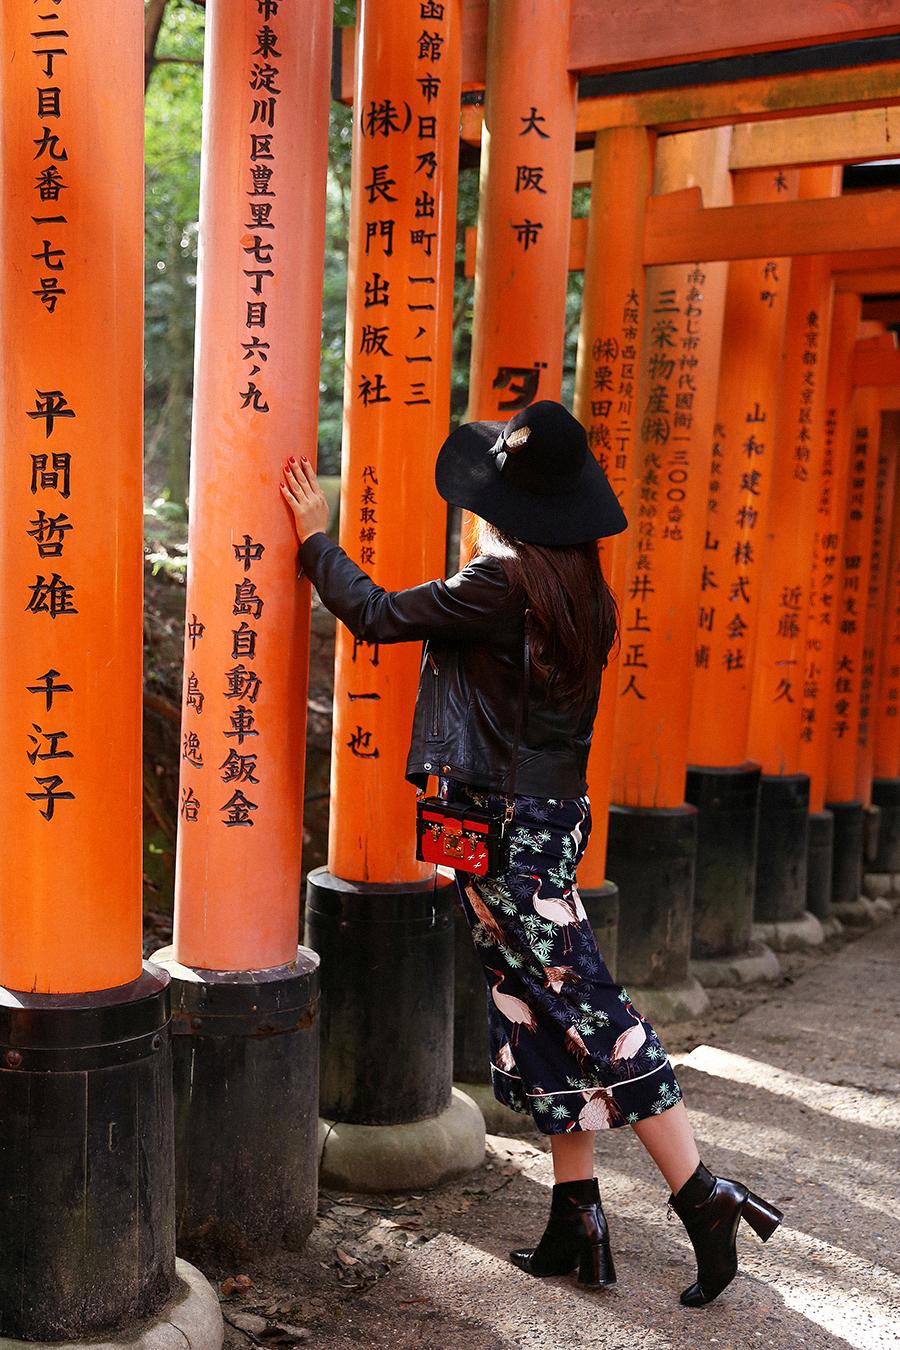 Kyoto, Japan: Fushimi Inari Taisha